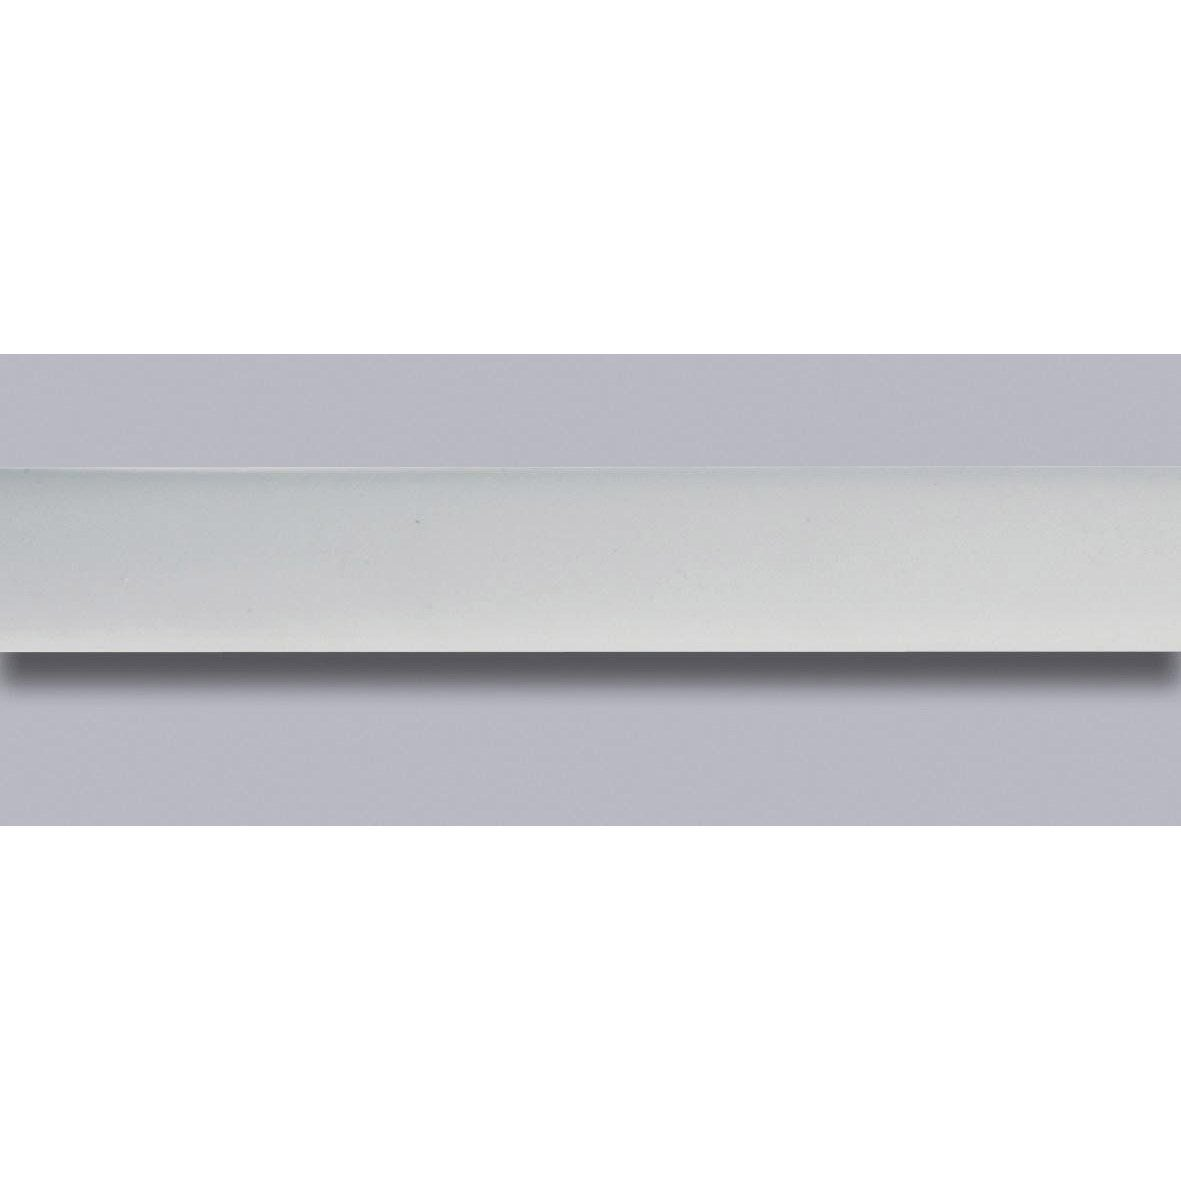 Barre de penderie blanc mat 120 cm leroy merlin - Penderie leroy merlin ...